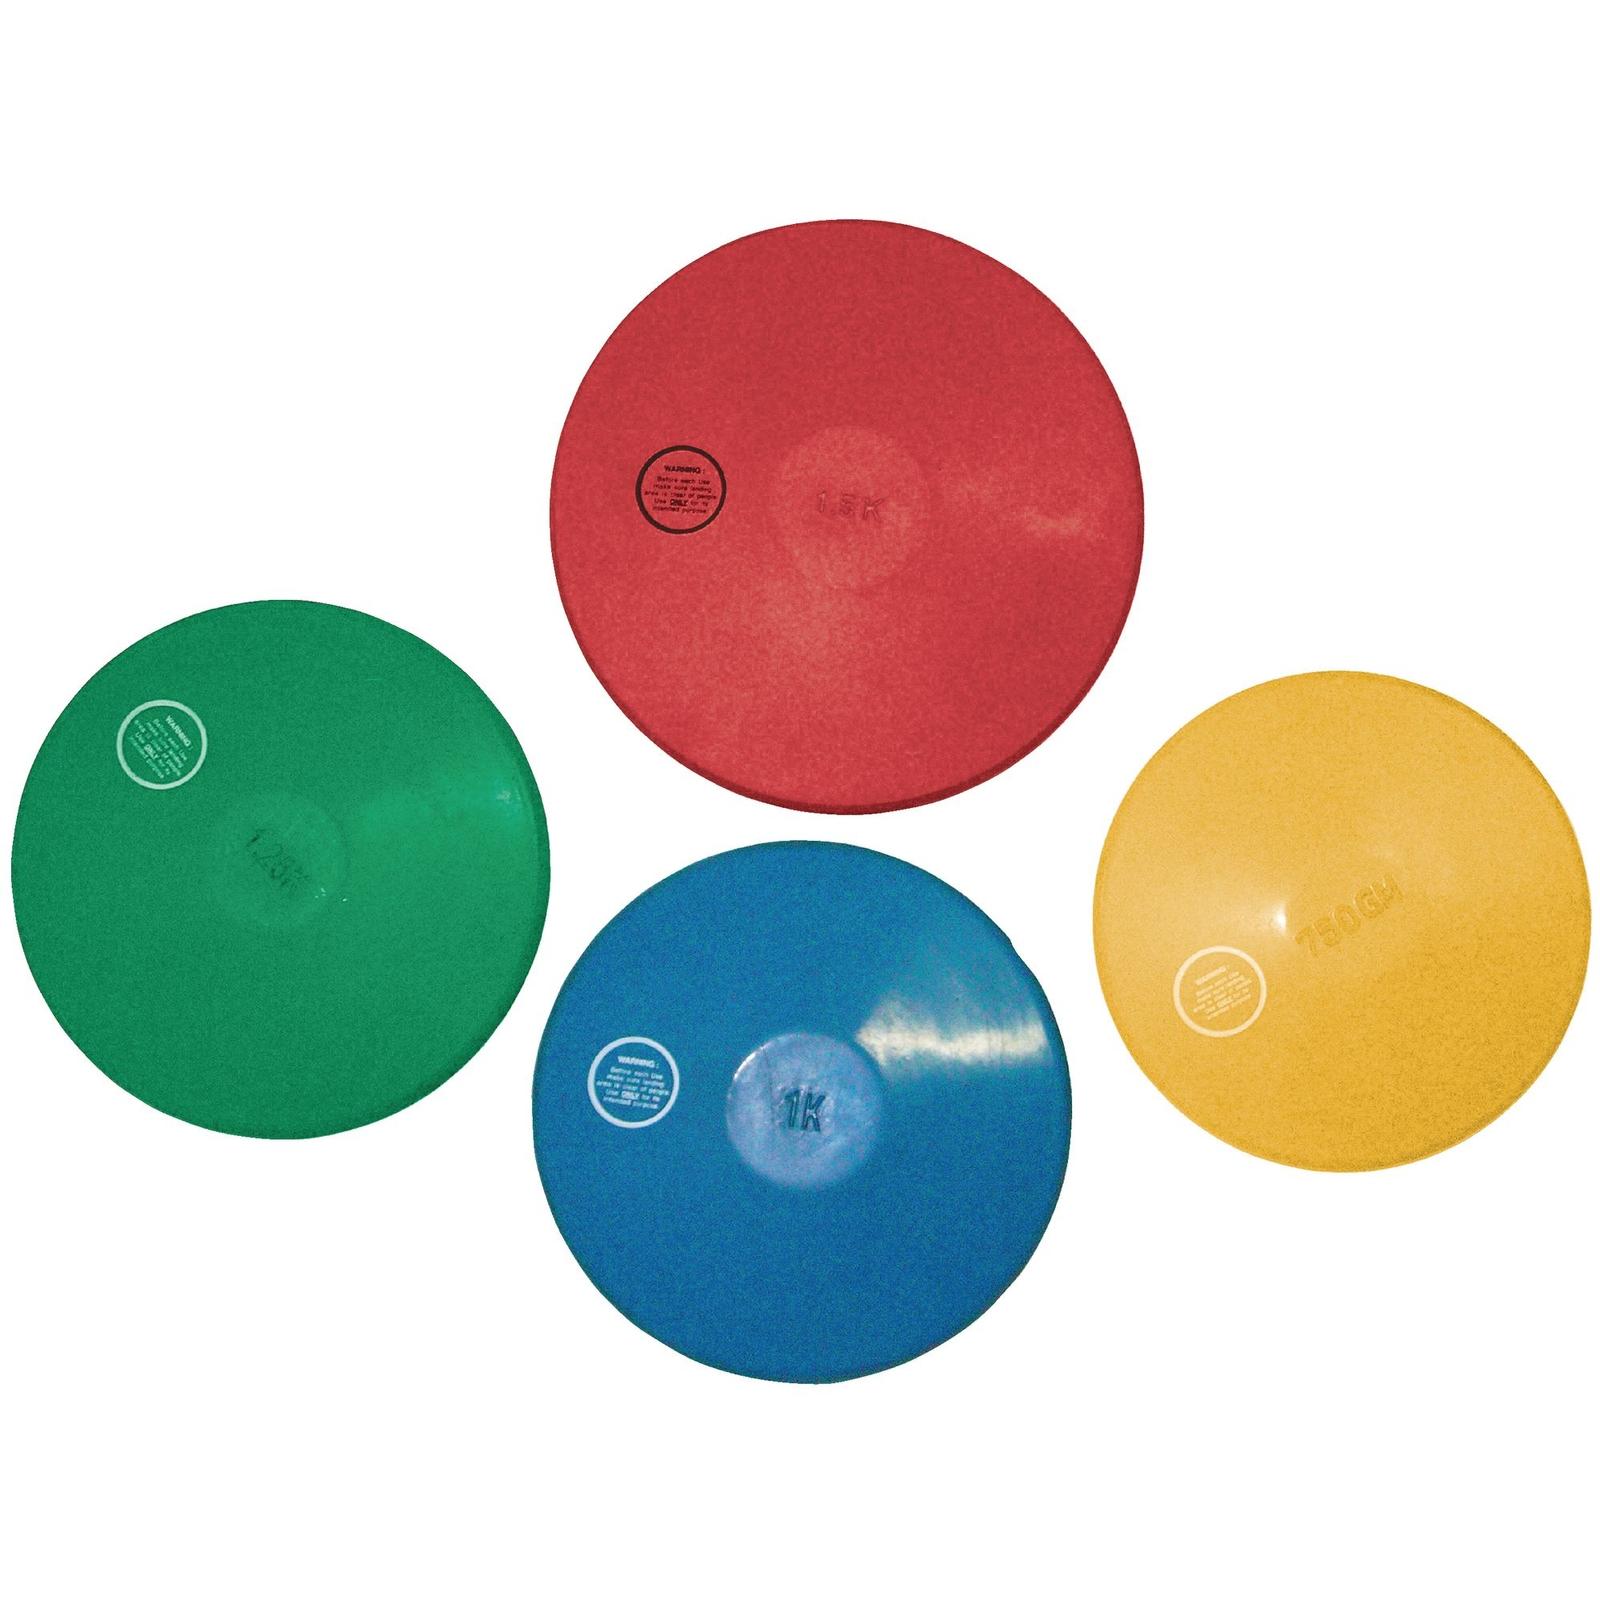 Vinex Rubber Indoor Discus - 1.5kg - Red